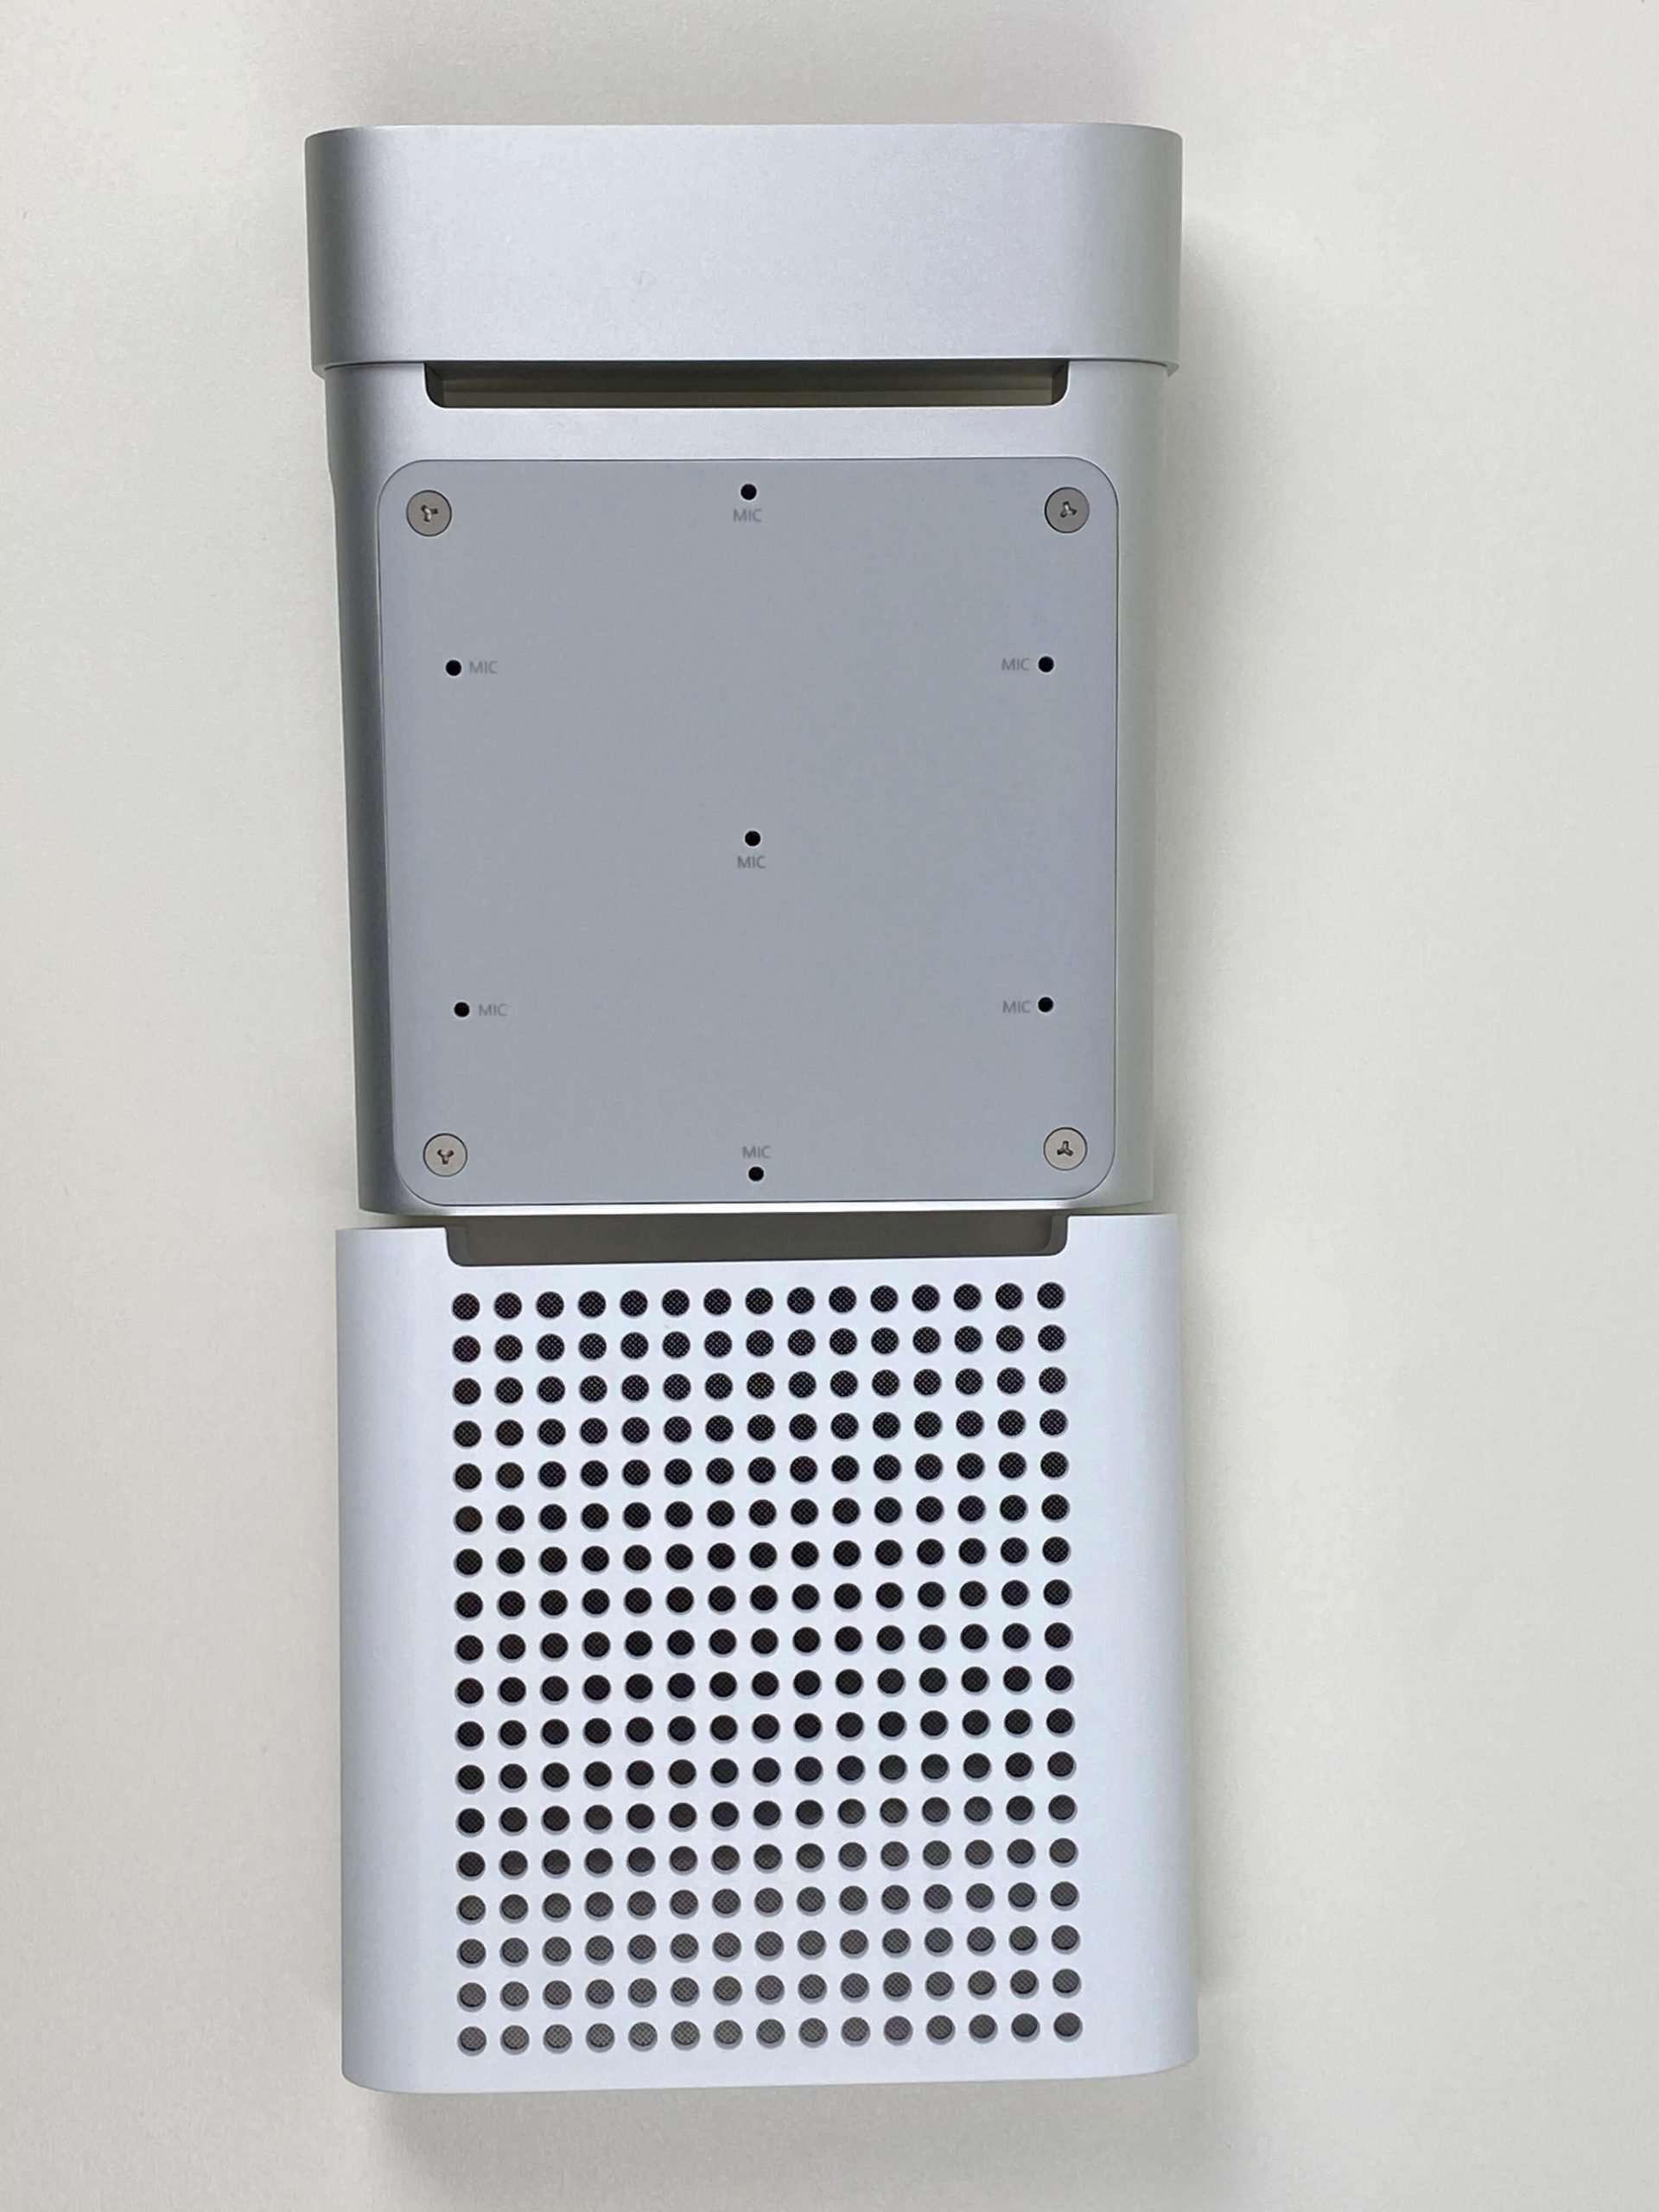 Azure Kinect Sensor – Top